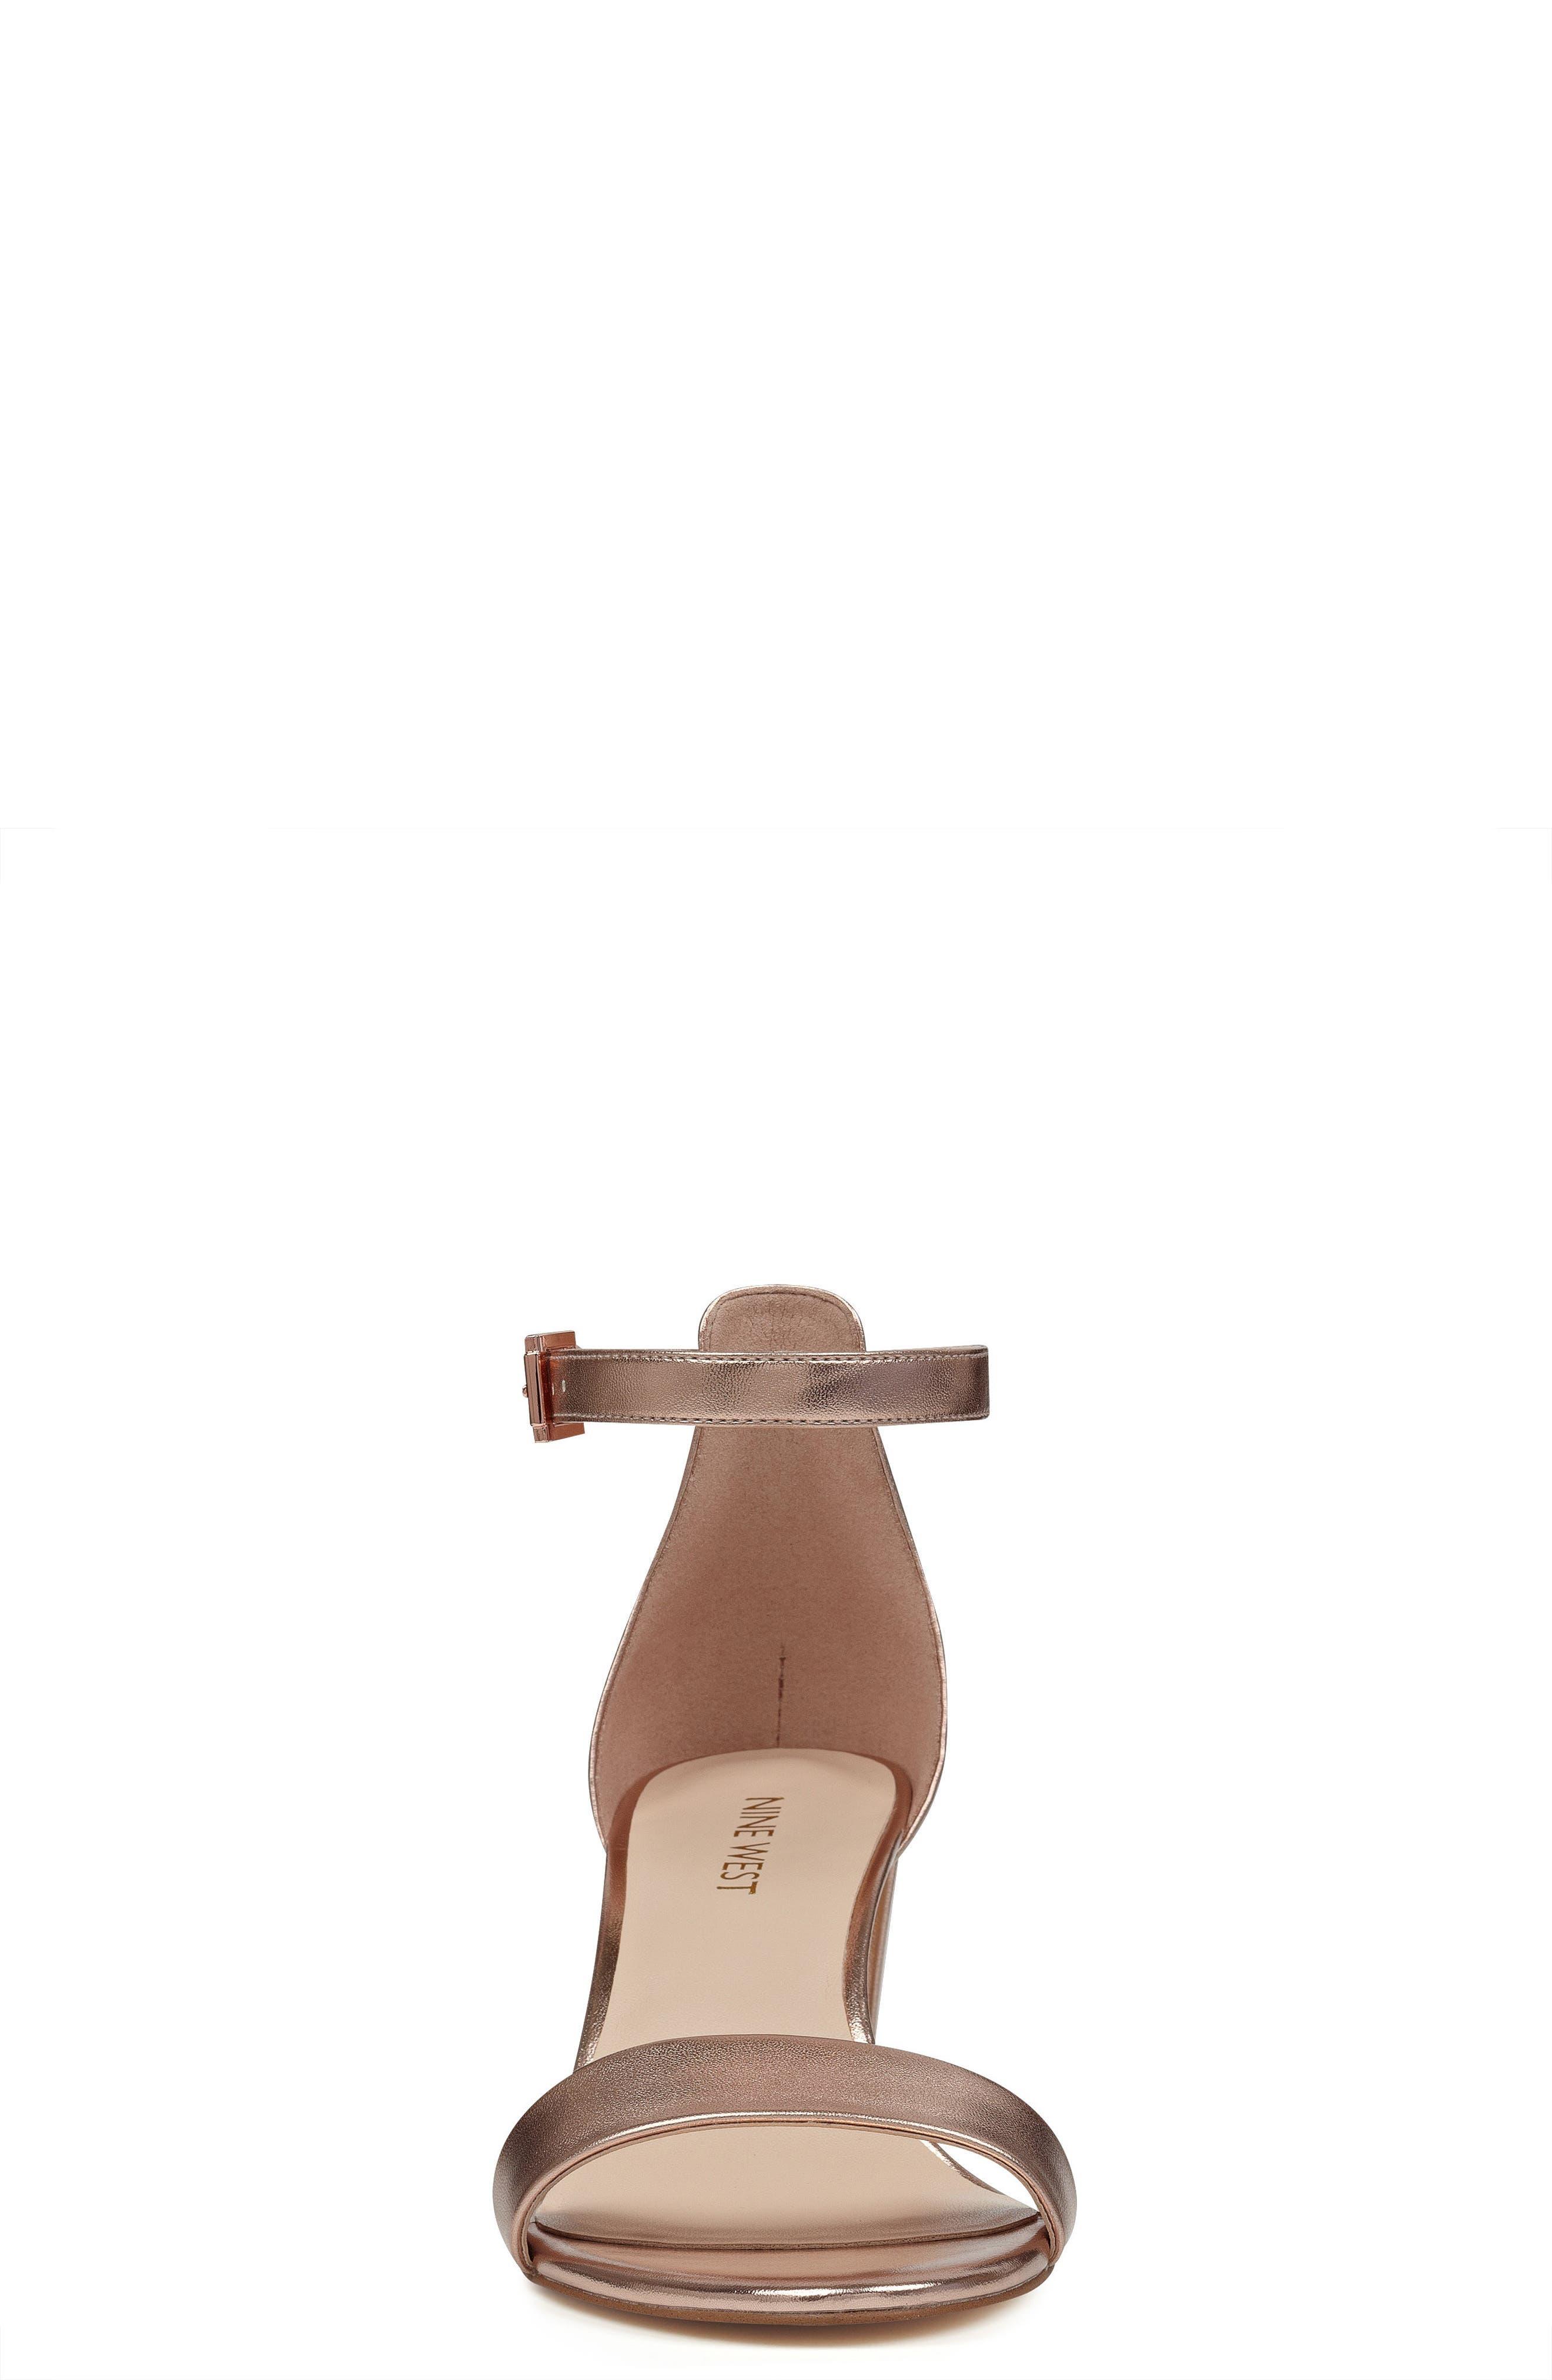 Pruce Ankle Strap Sandal,                             Alternate thumbnail 4, color,                             Matte Rose Gold